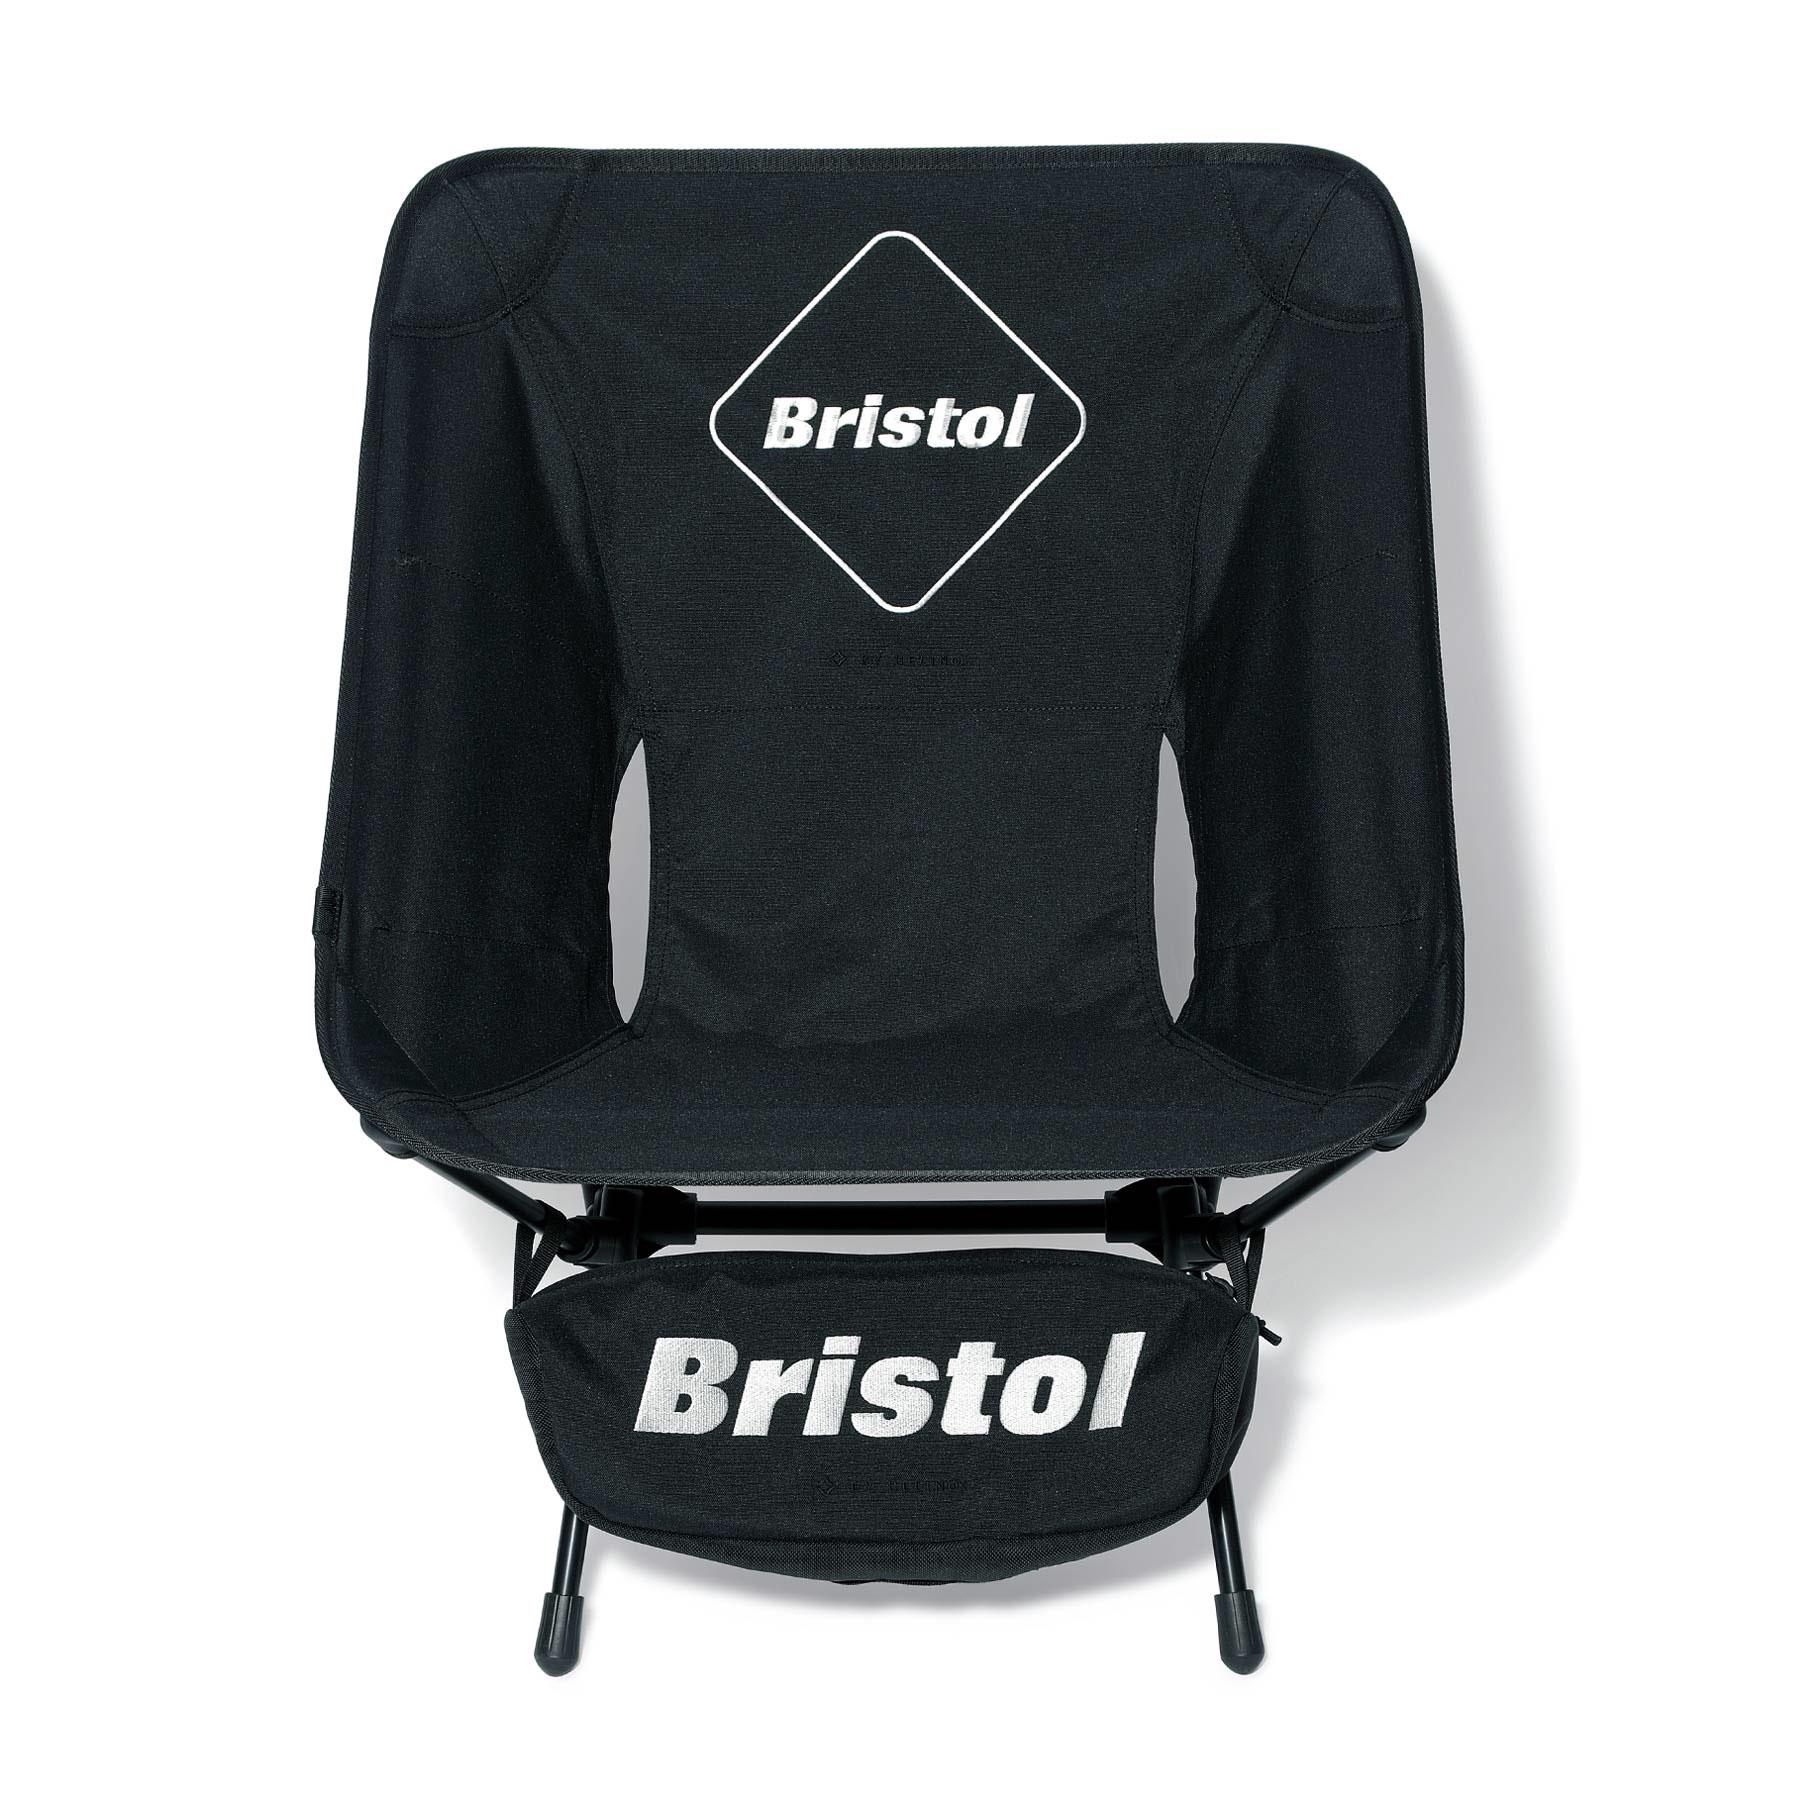 F.C.Real Bristol / HELINOX EMBLEM FOLDING CHAIR